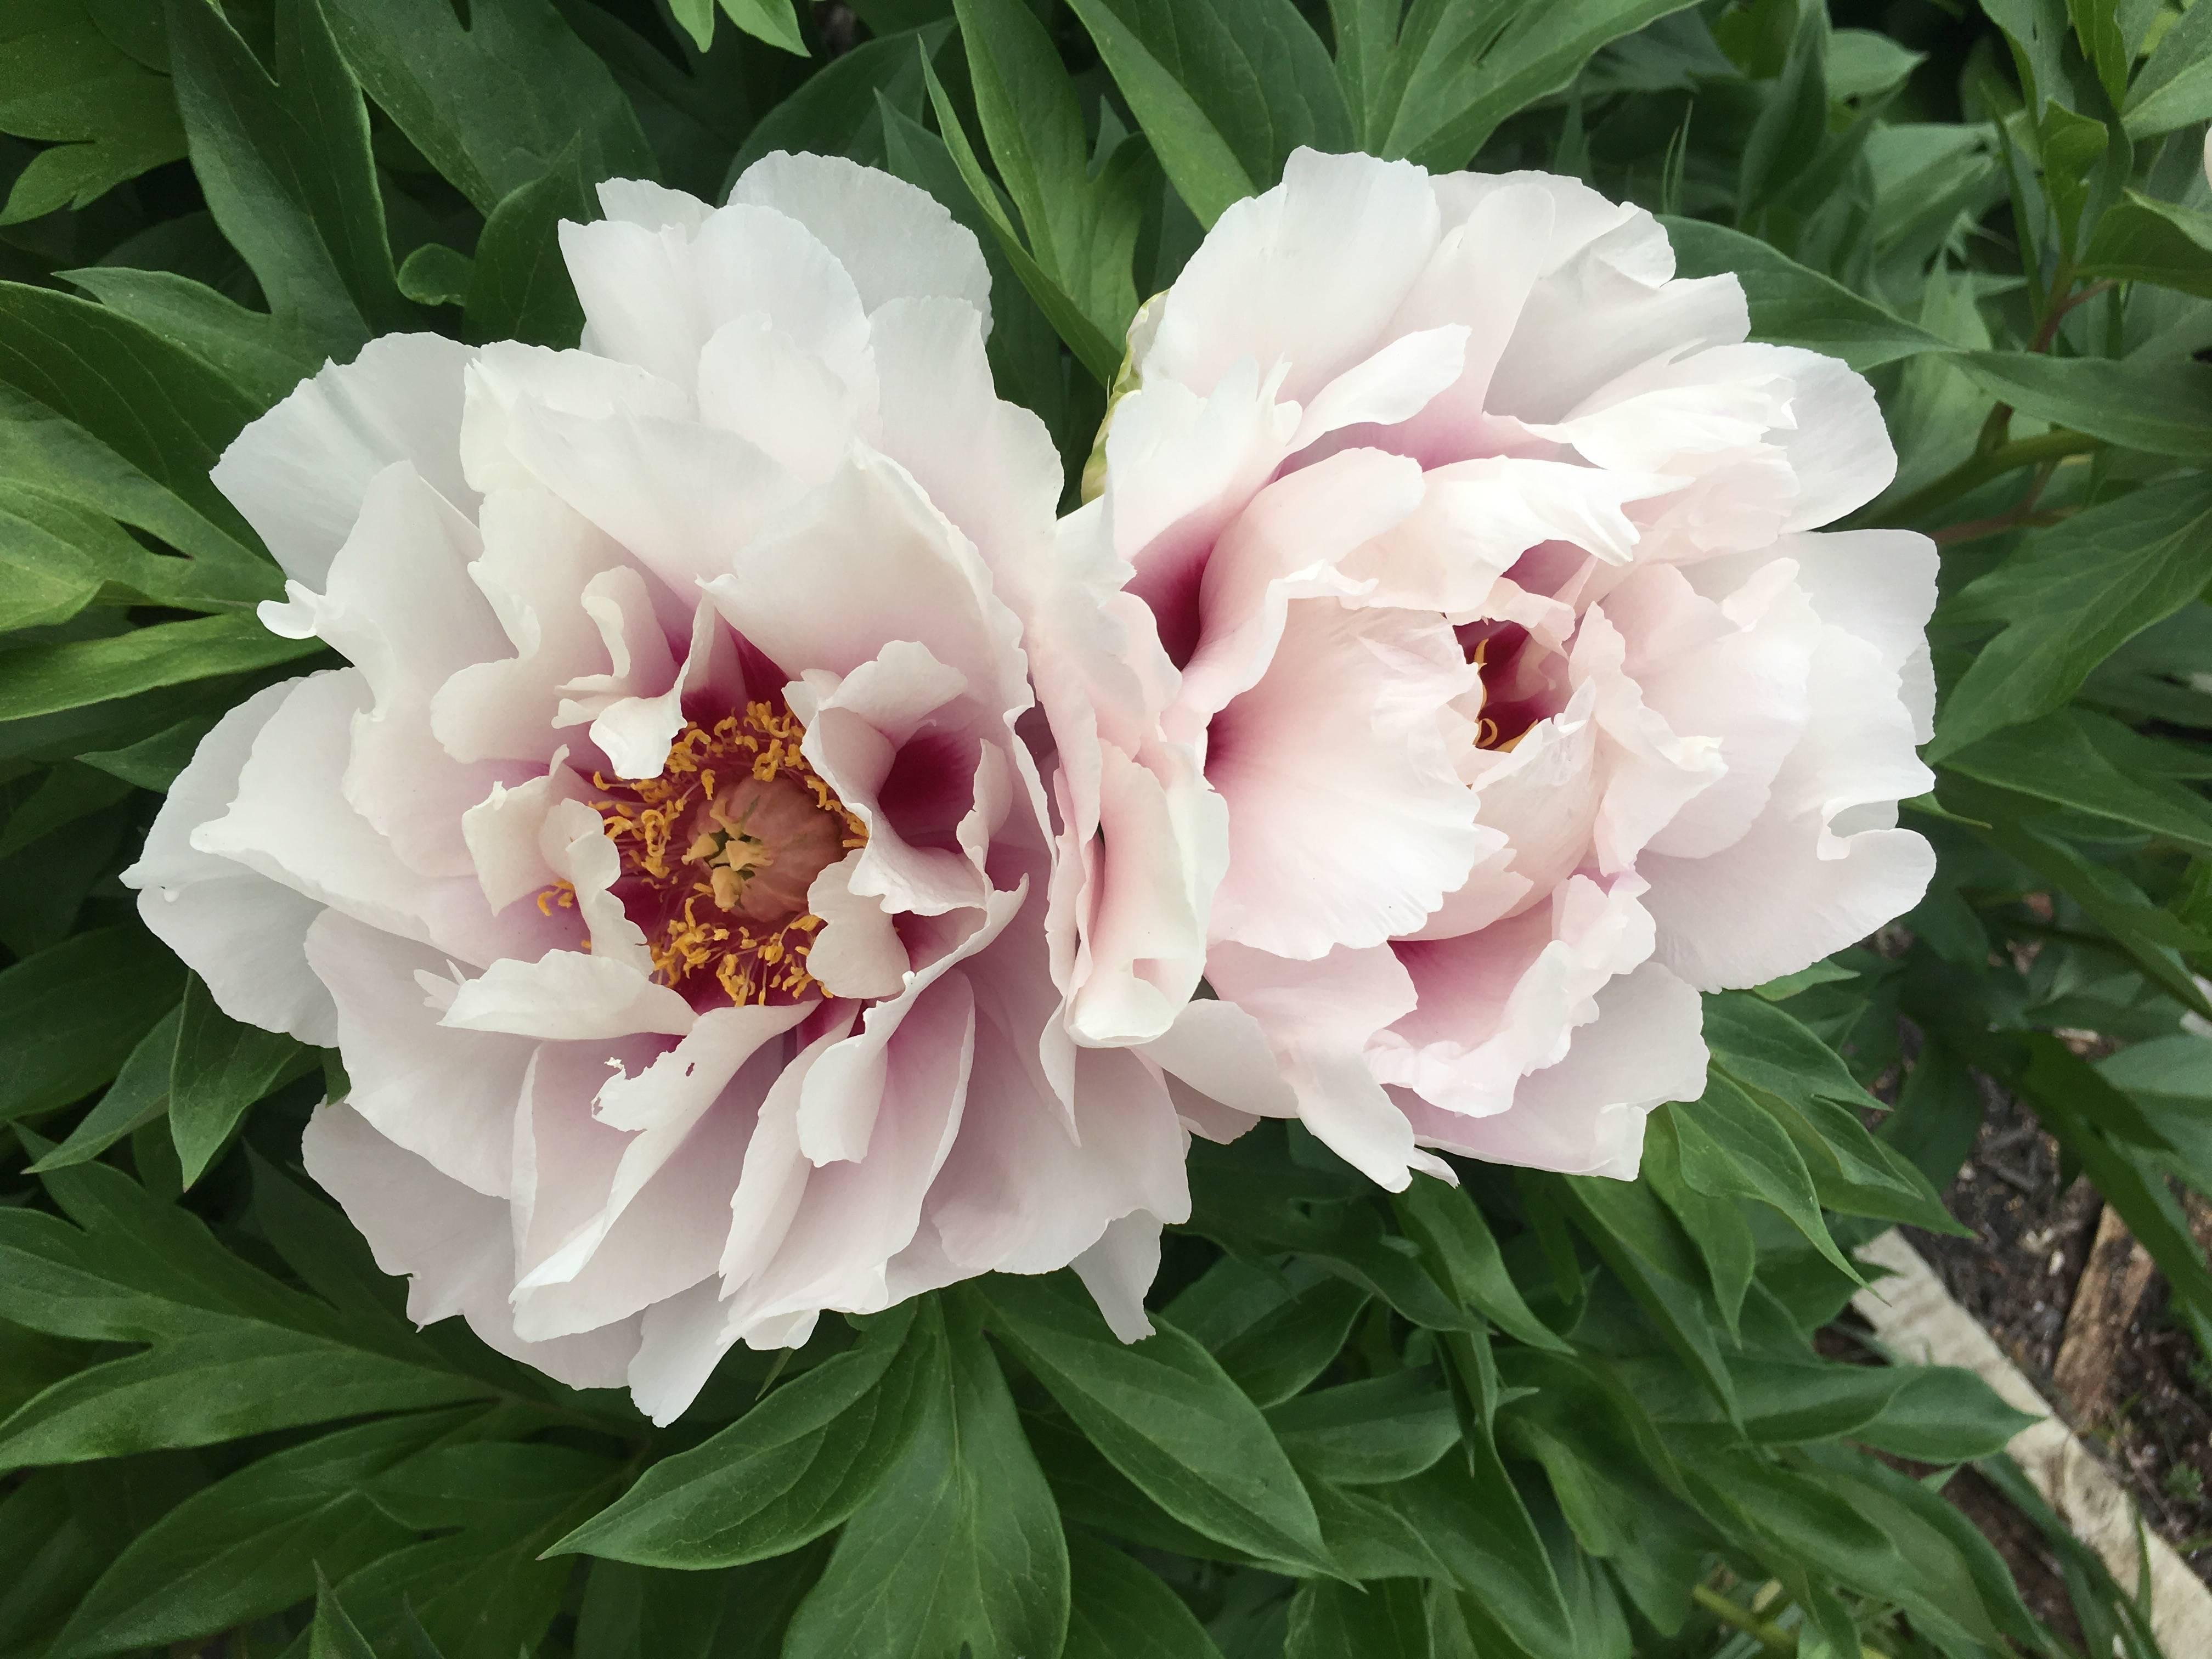 97d2bfb71e373c953fd0_flowers.jpg